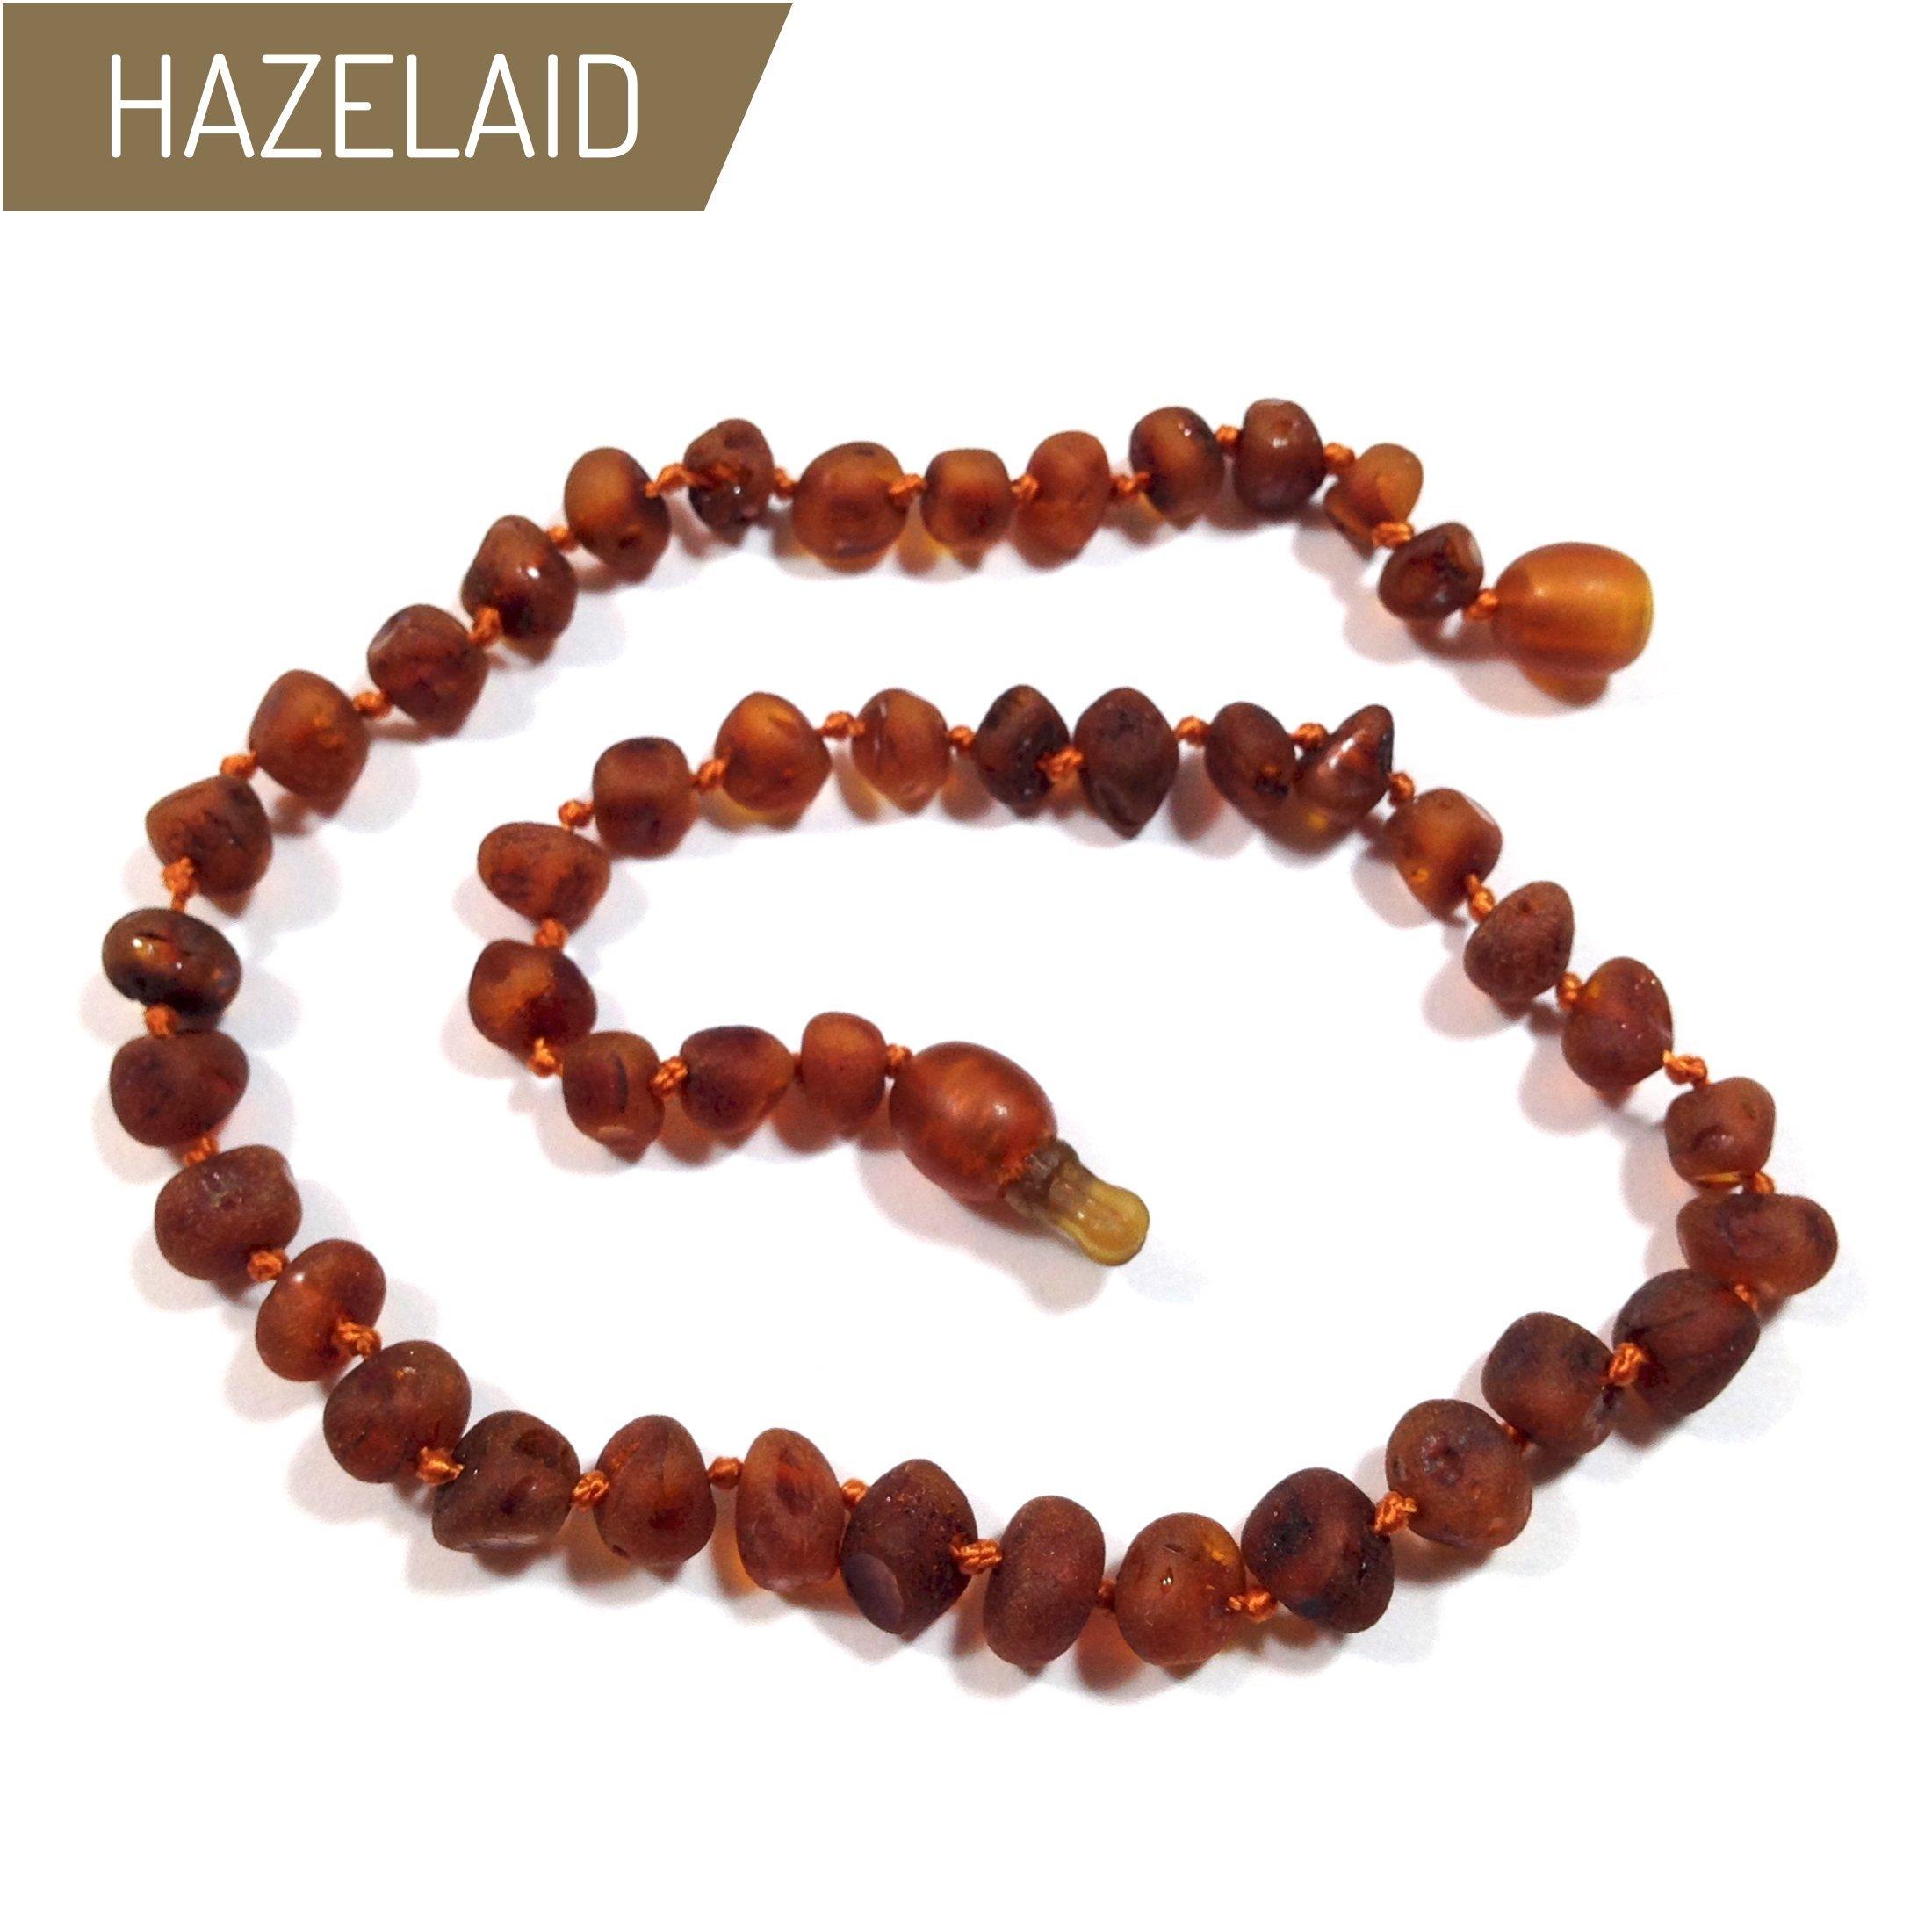 Hazelaid (TM) 14'' Pop-Clasp Baltic Amber Nutmeg Necklace